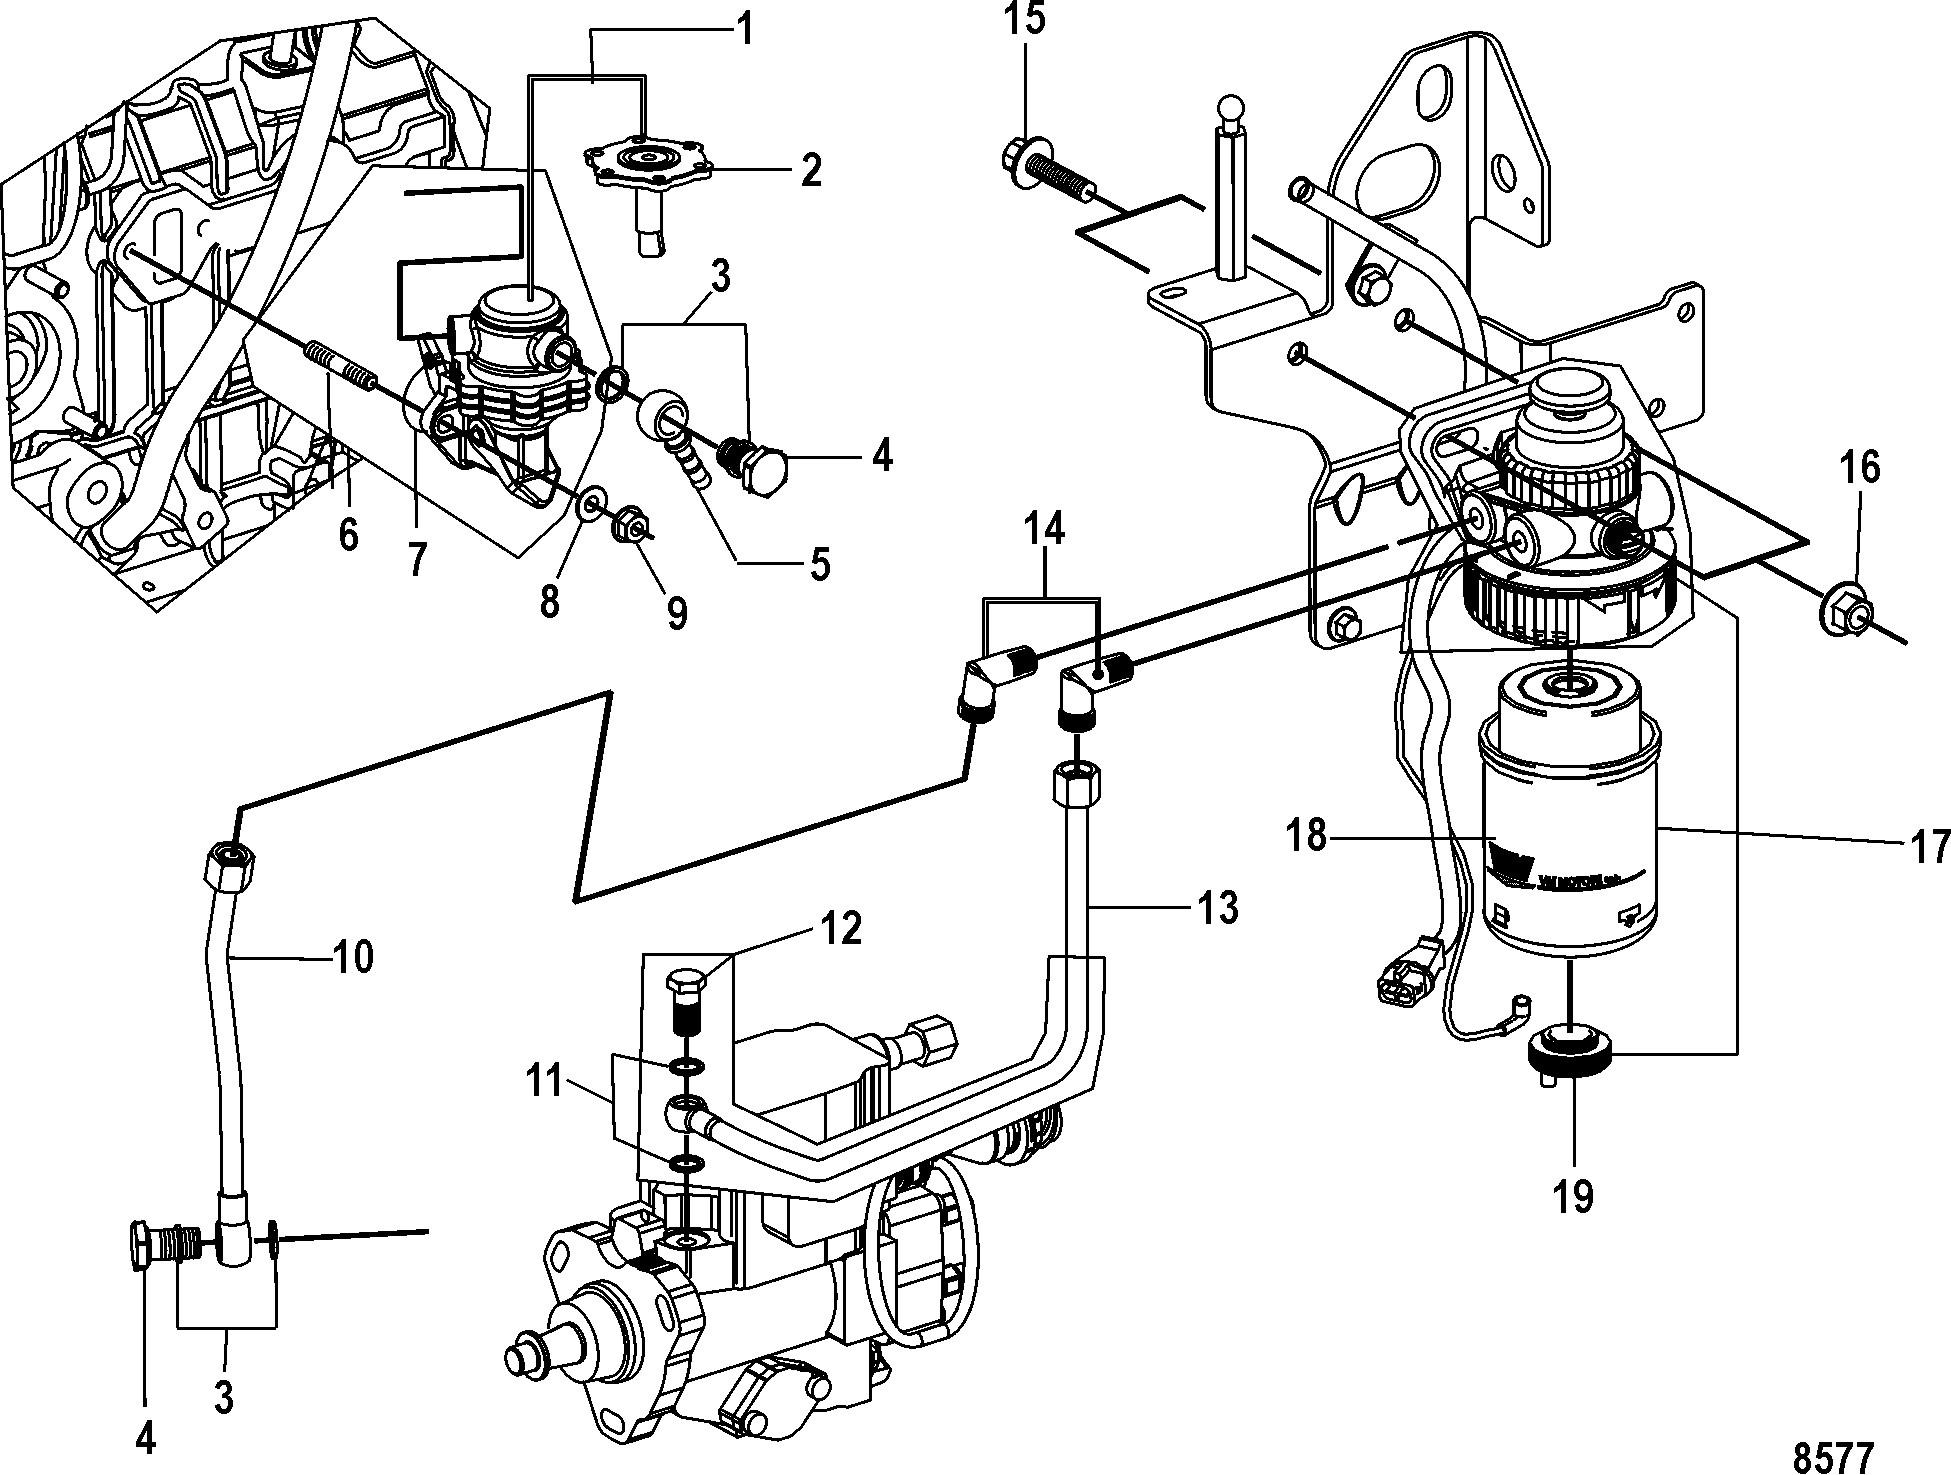 2001 Mercruiser 3 0 Engine Diagram - Auto Wiring Diagram Today •